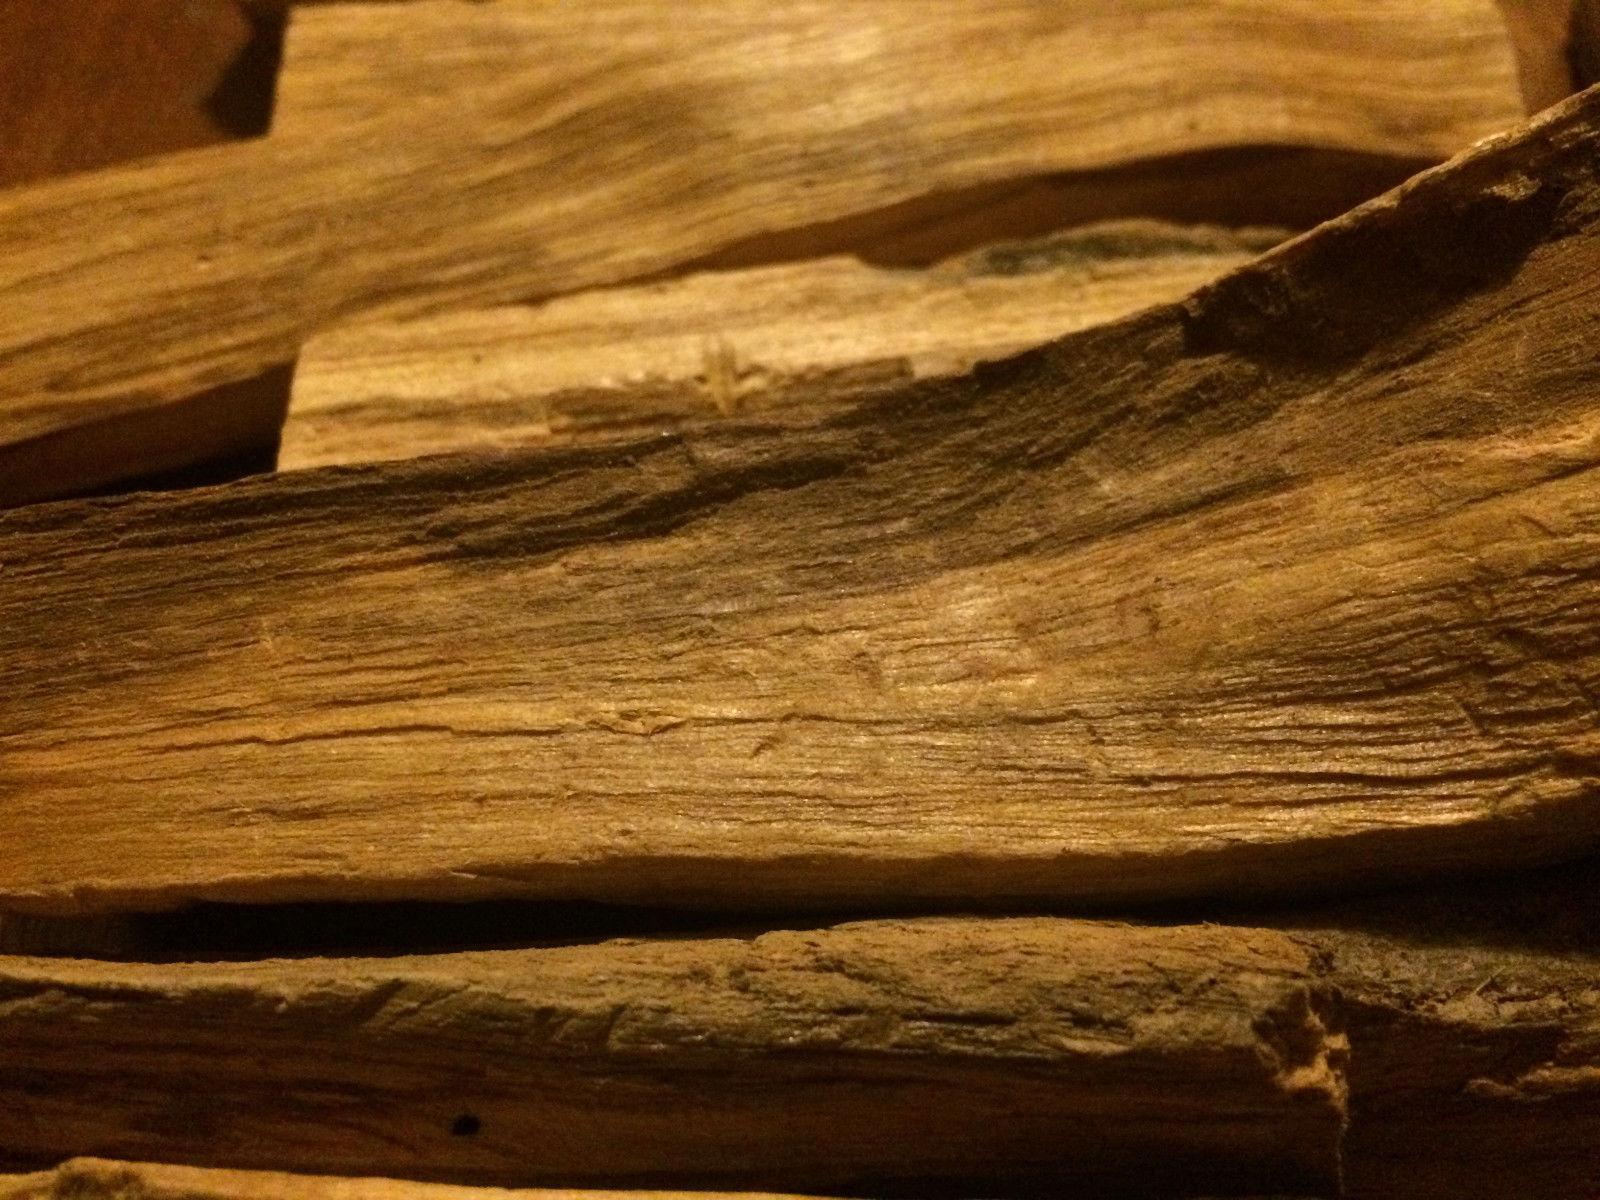 Palo Santo Incense Sticks (Bursera graveolens) 2 lb. Organic Peru